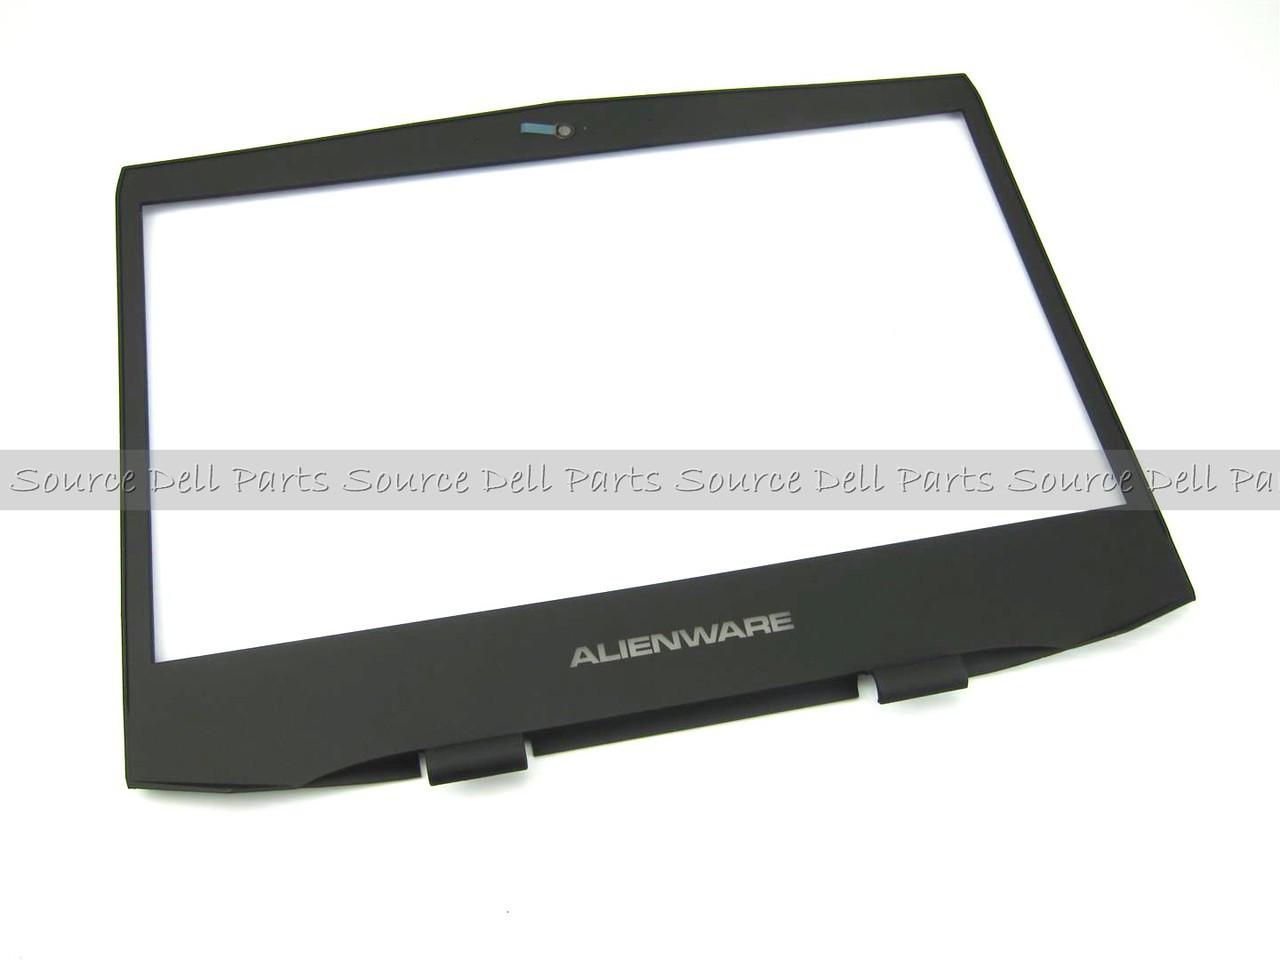 "Alienware 14 R1 14"" LCD Front Trim Bezel - 6FVWM (A)"